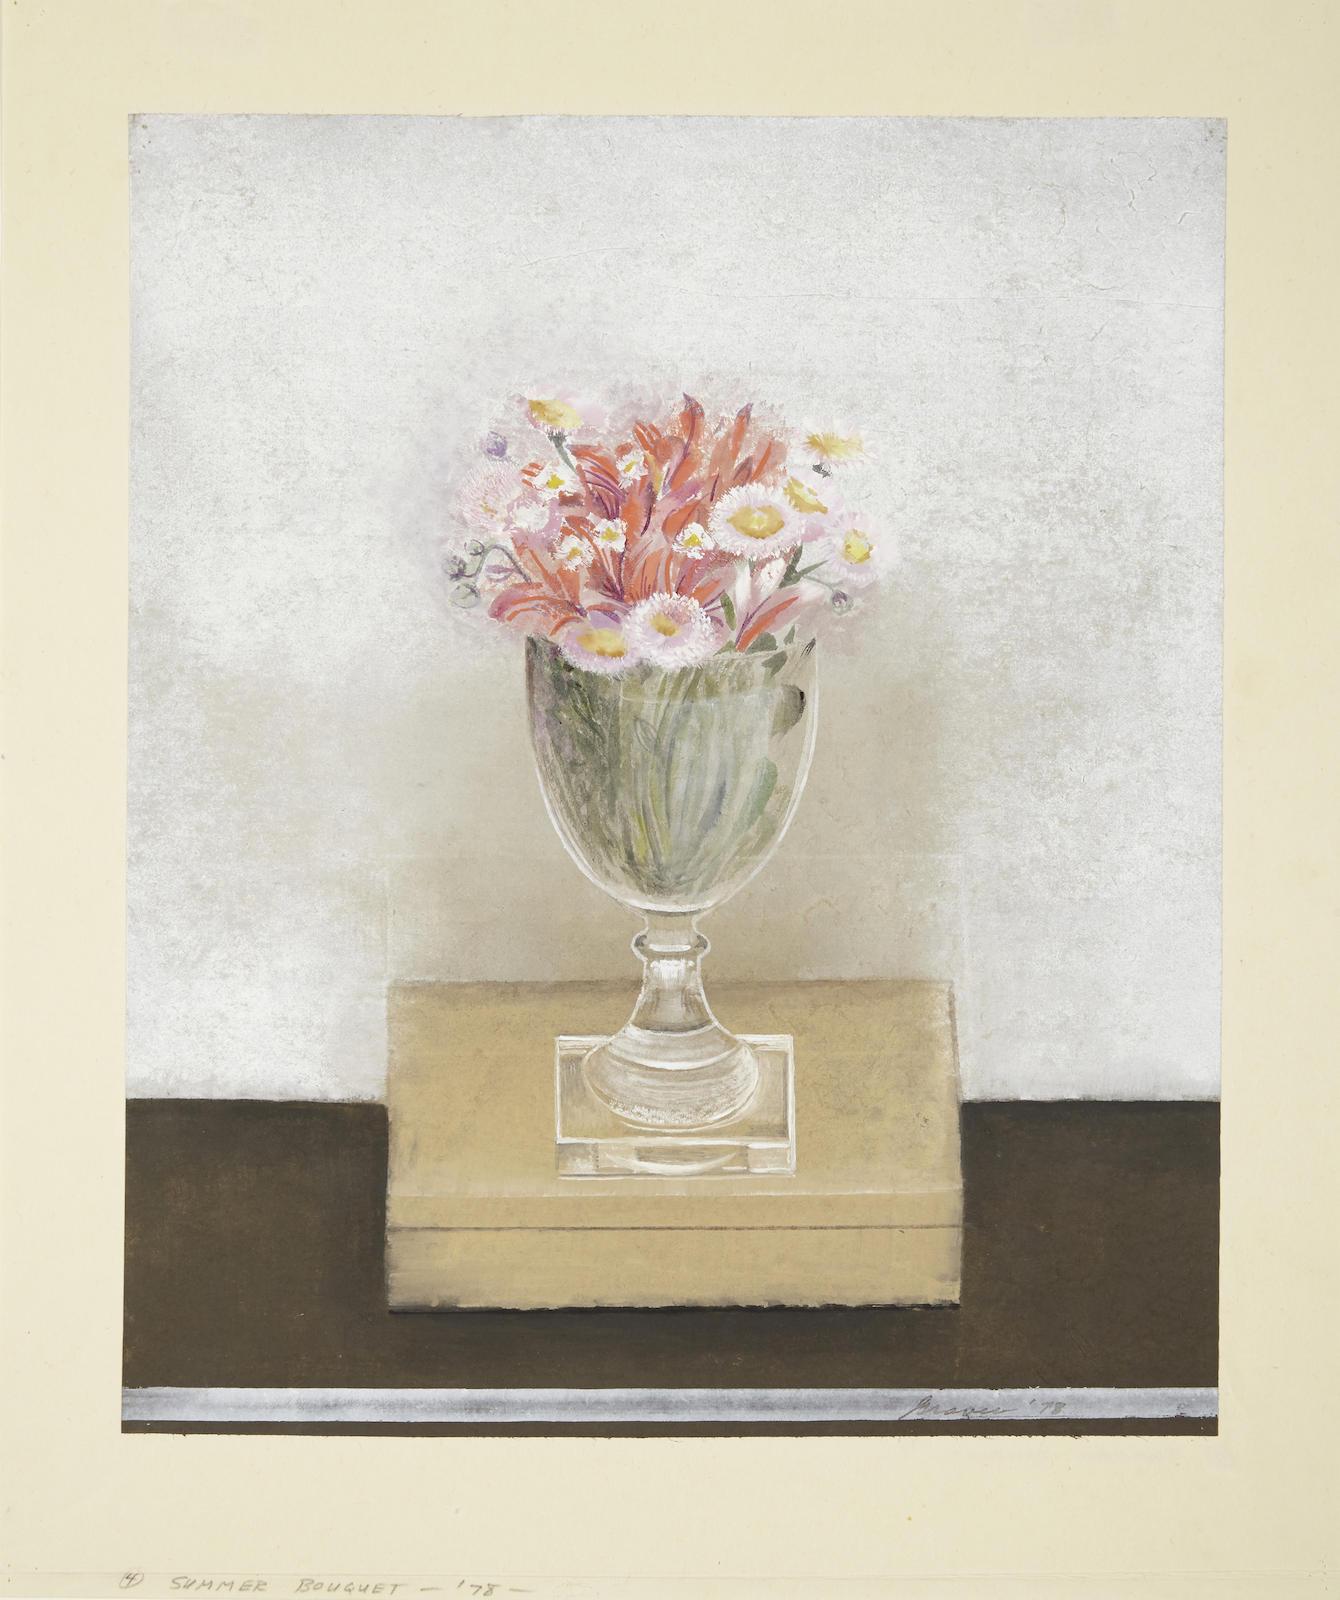 Morris Graves-Summer Bouquet-1978